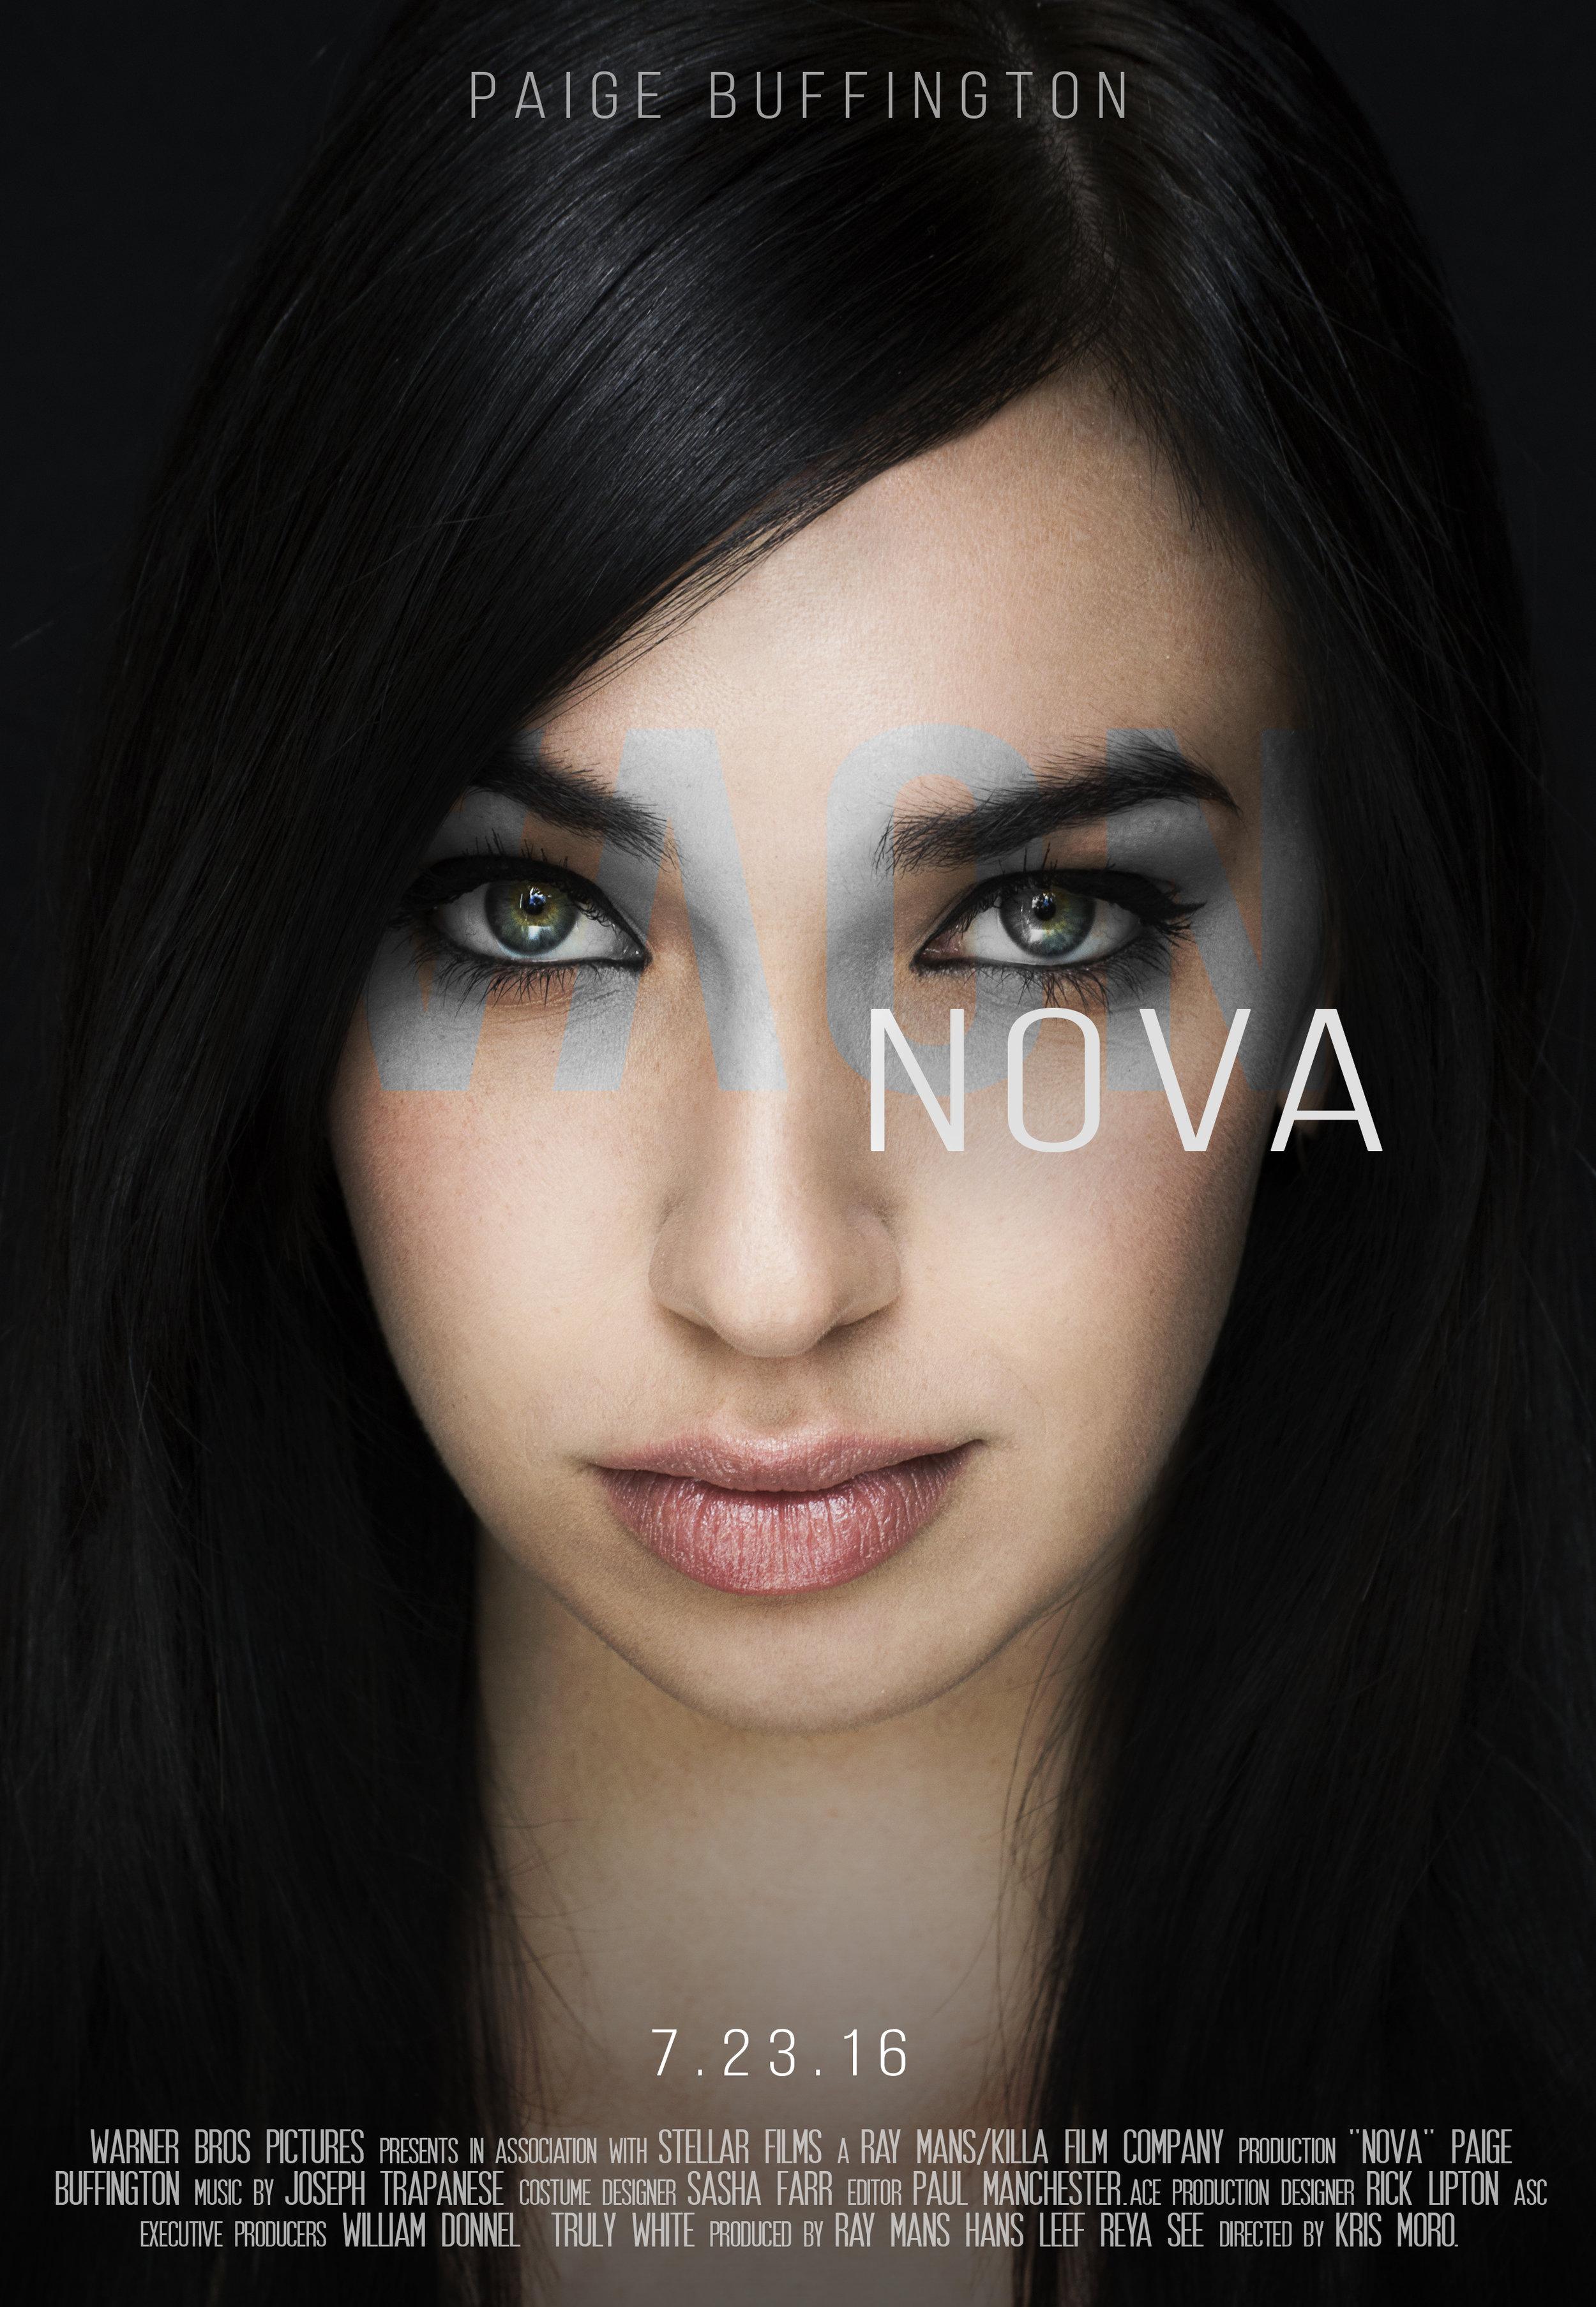 """Nova""  Movie poster inspired by the artwork for ""Salt"", photo self-taken March 2016"